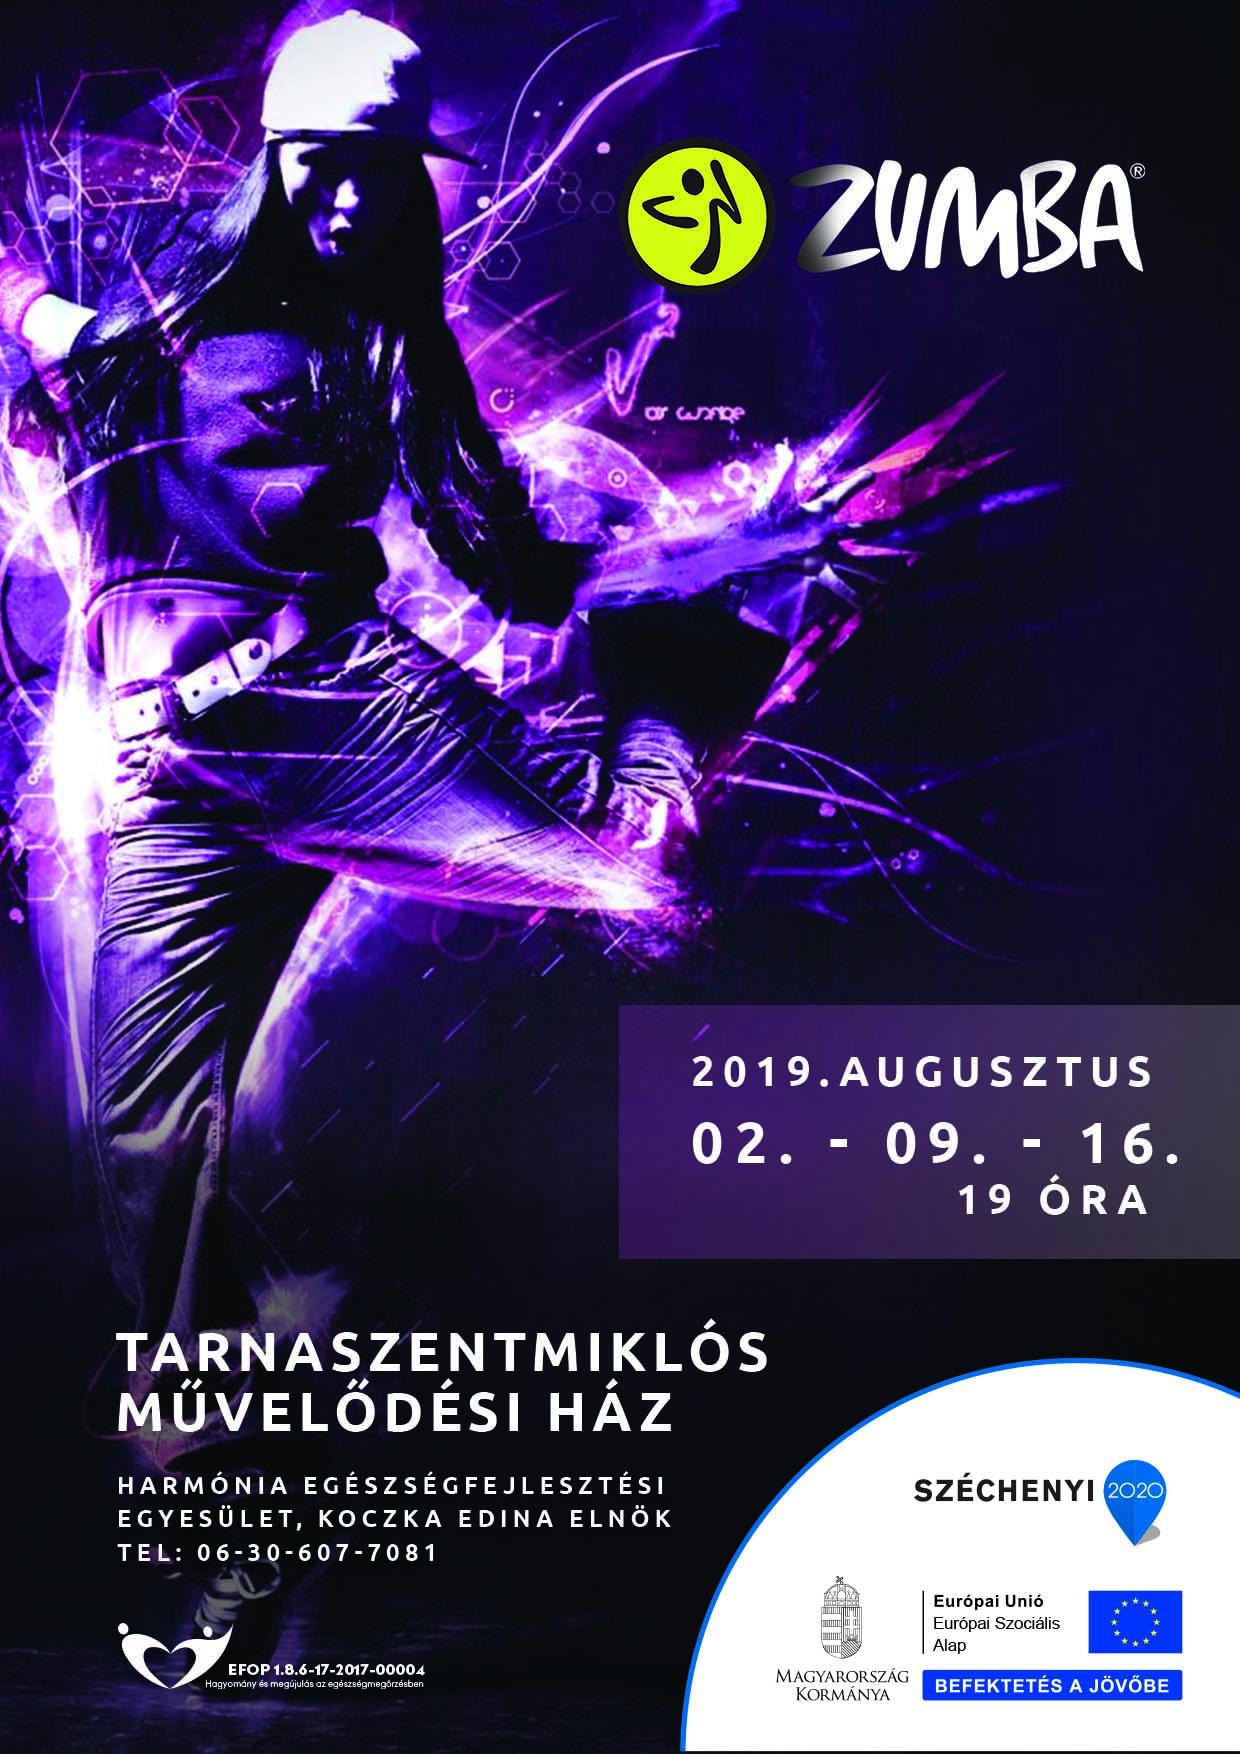 Tarnaszentmiklós – Zumba – 2019. augusztus